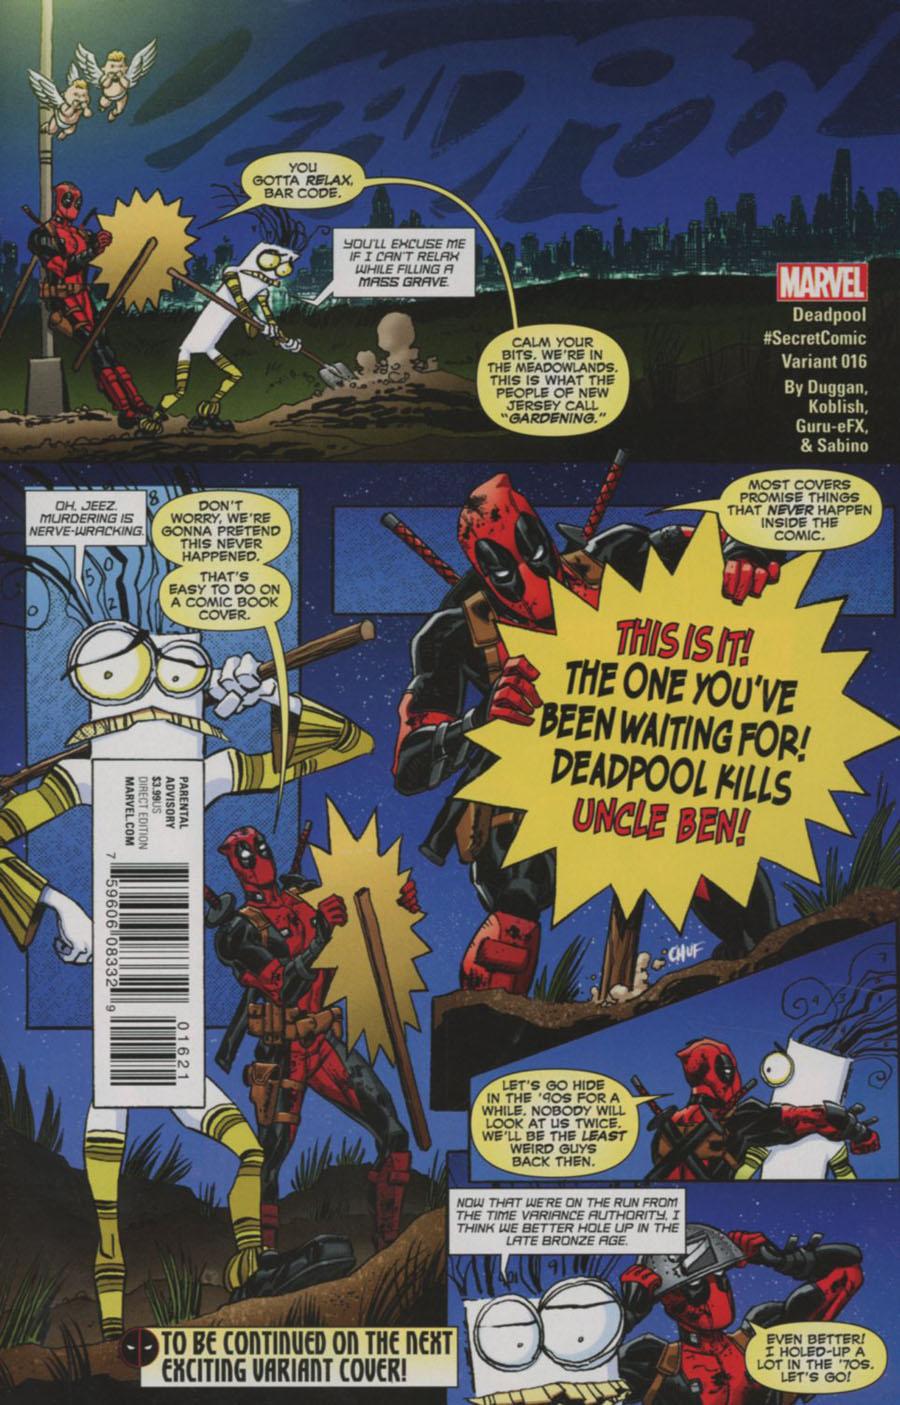 Deadpool Vol 5 #16 Cover B Variant Scott Koblish Secret Comic Cover (Civil War II Tie-In)